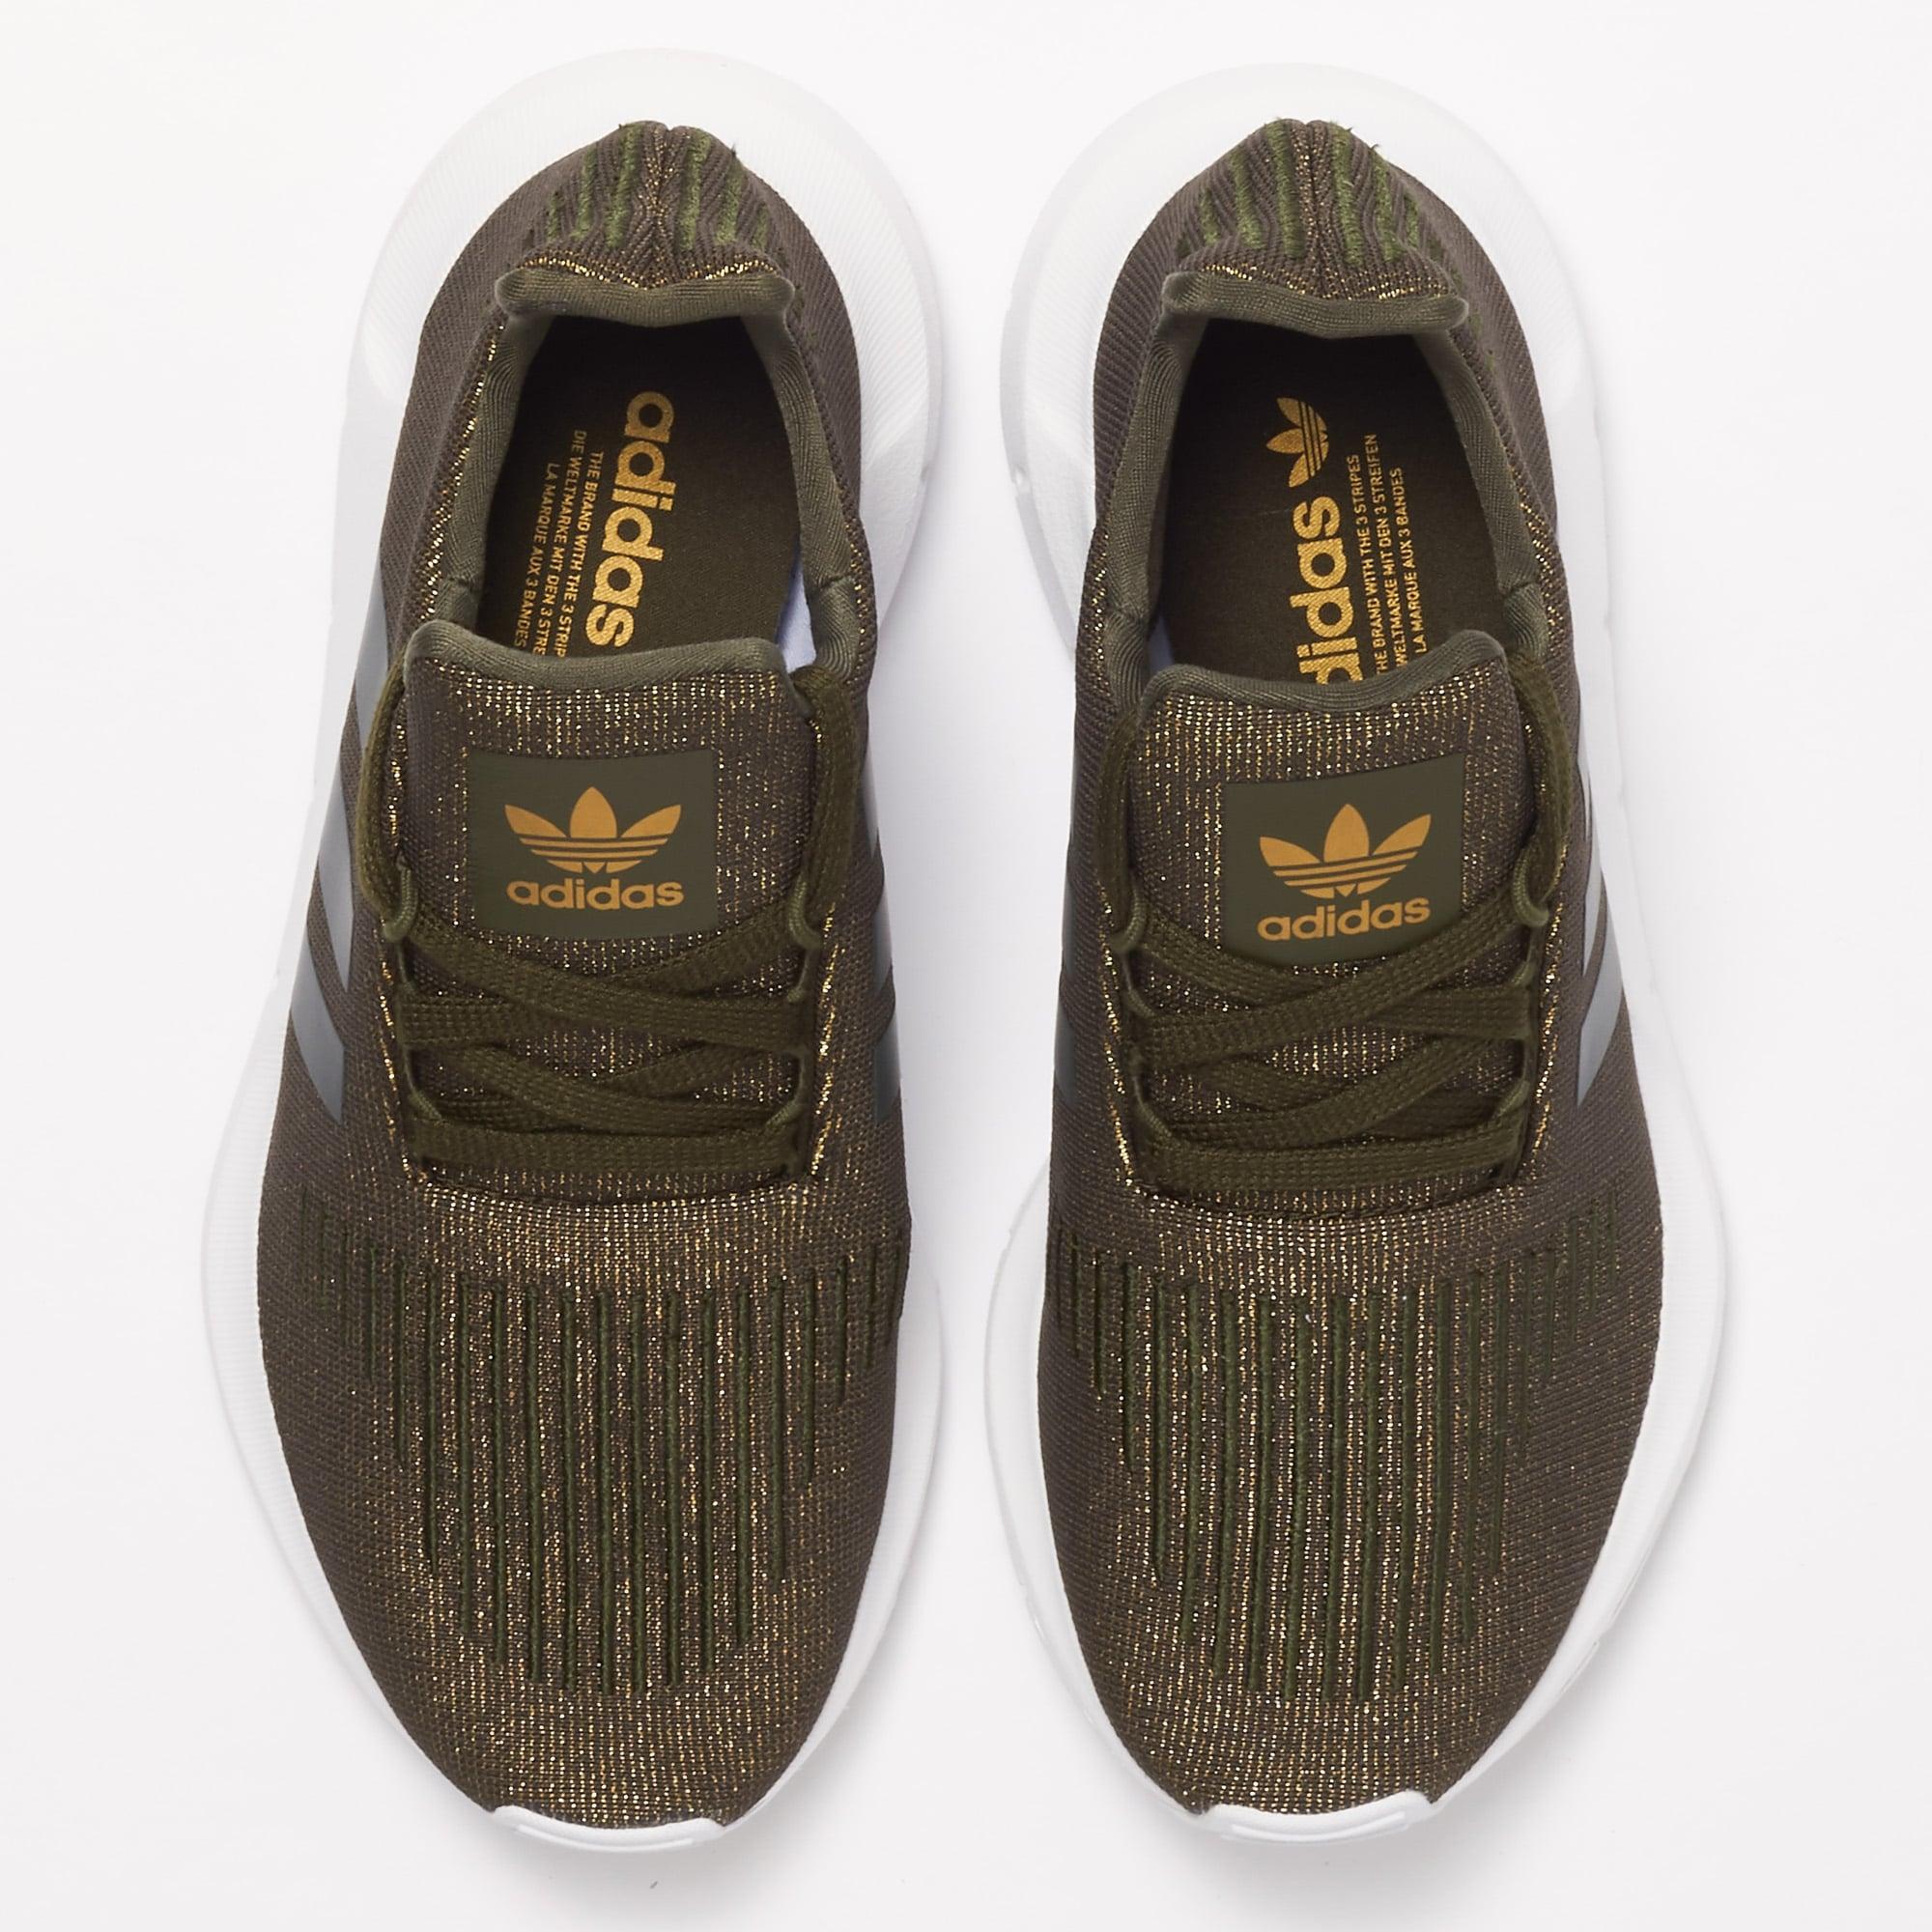 e3f72d8fa75c1 Adidas Originals Womens Swift Run Trainers